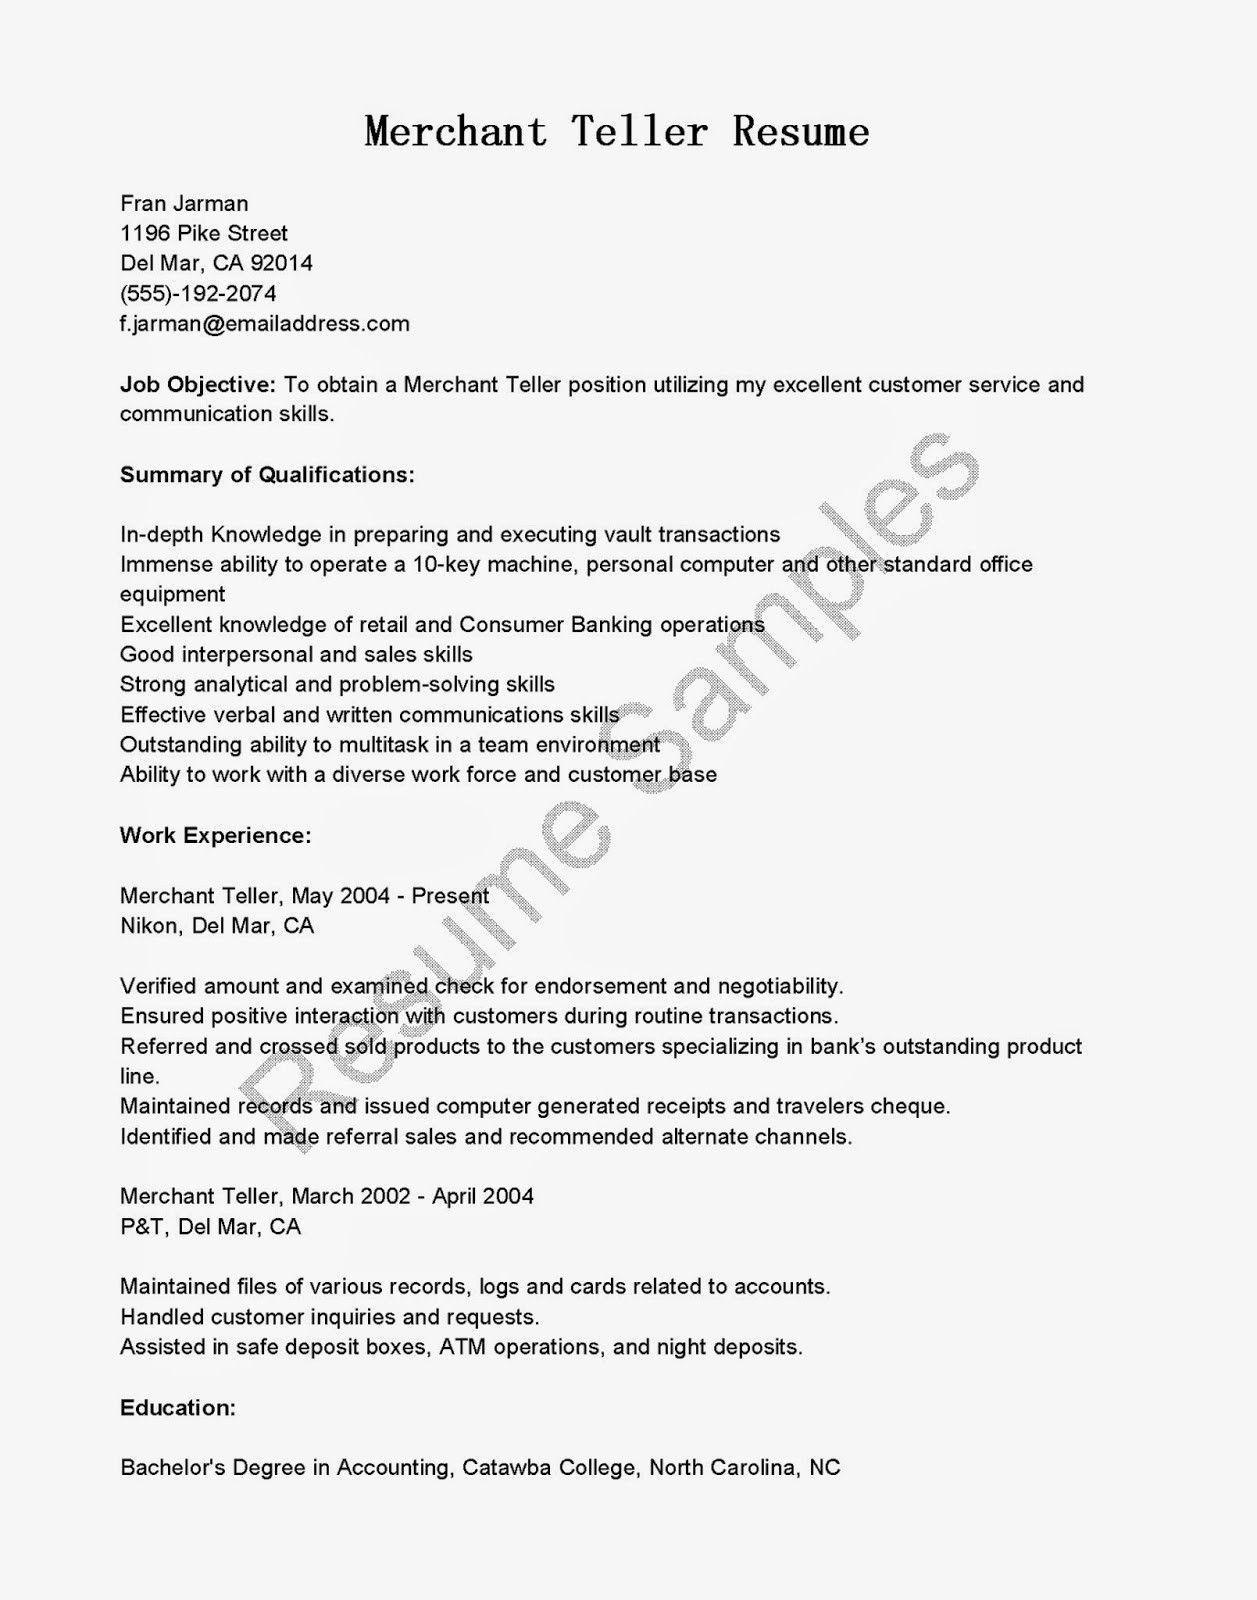 Resume for Bank Tellers Ideal Resume Samples Merchant